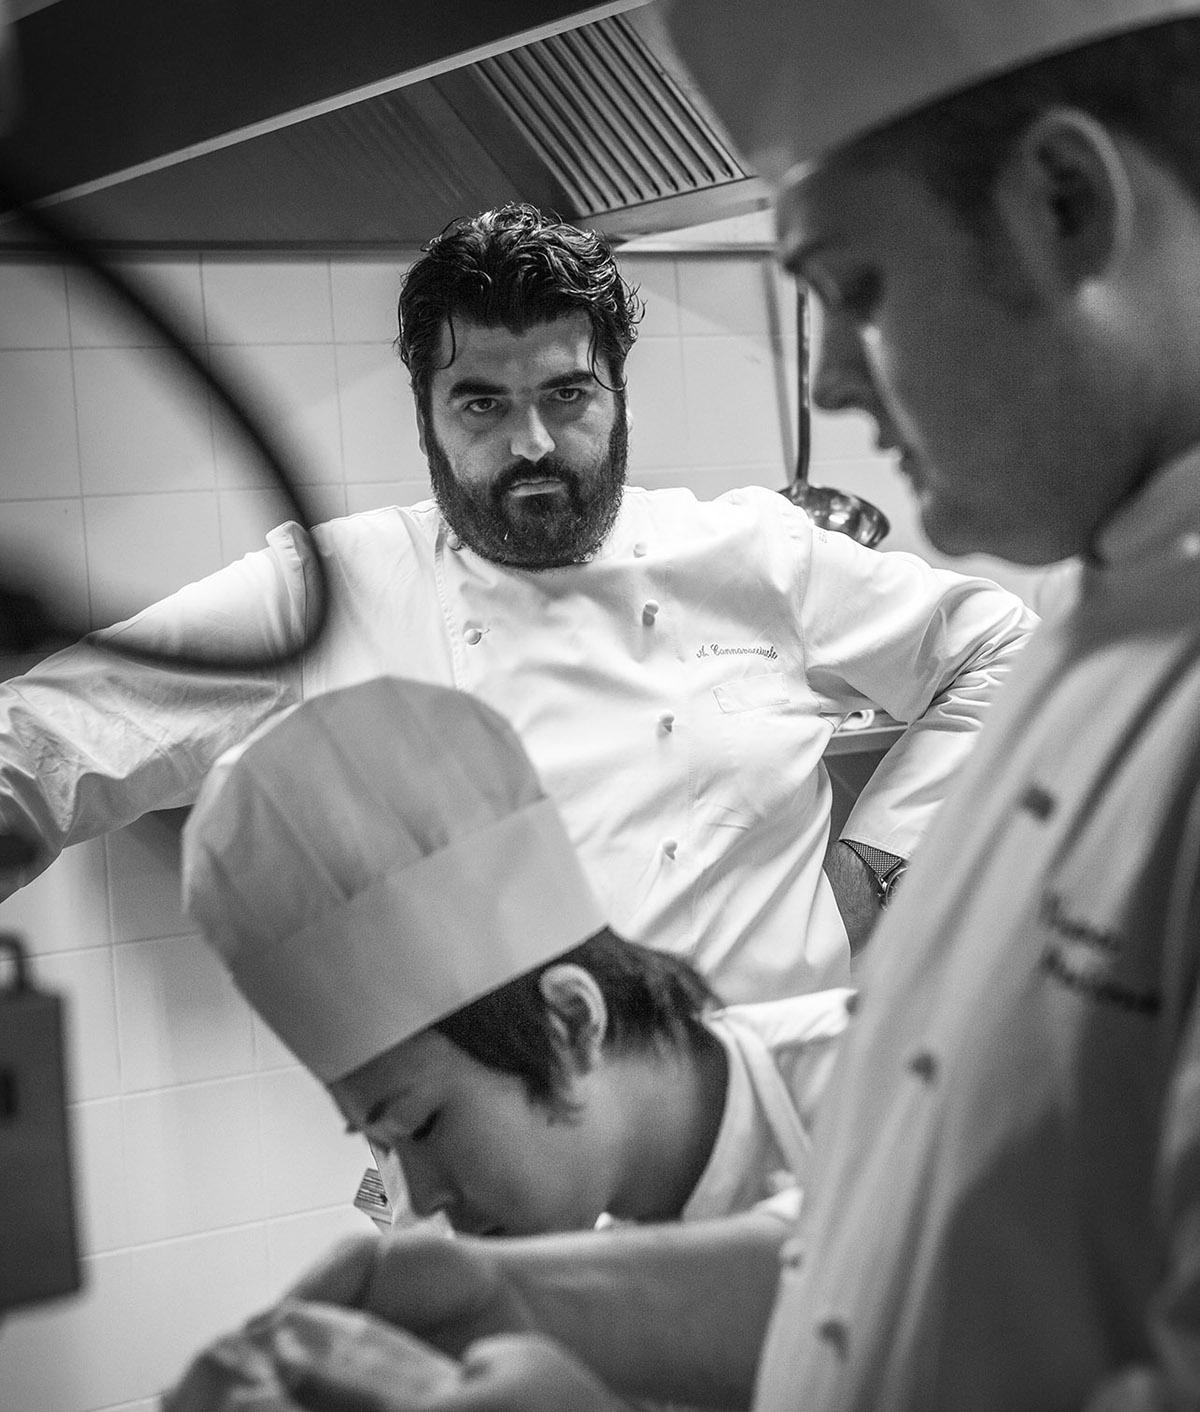 Antonio Cannavacciuolo Fish & chef- 2013 - Villa Cordevigo Wine Relais - Cavaion Veronese